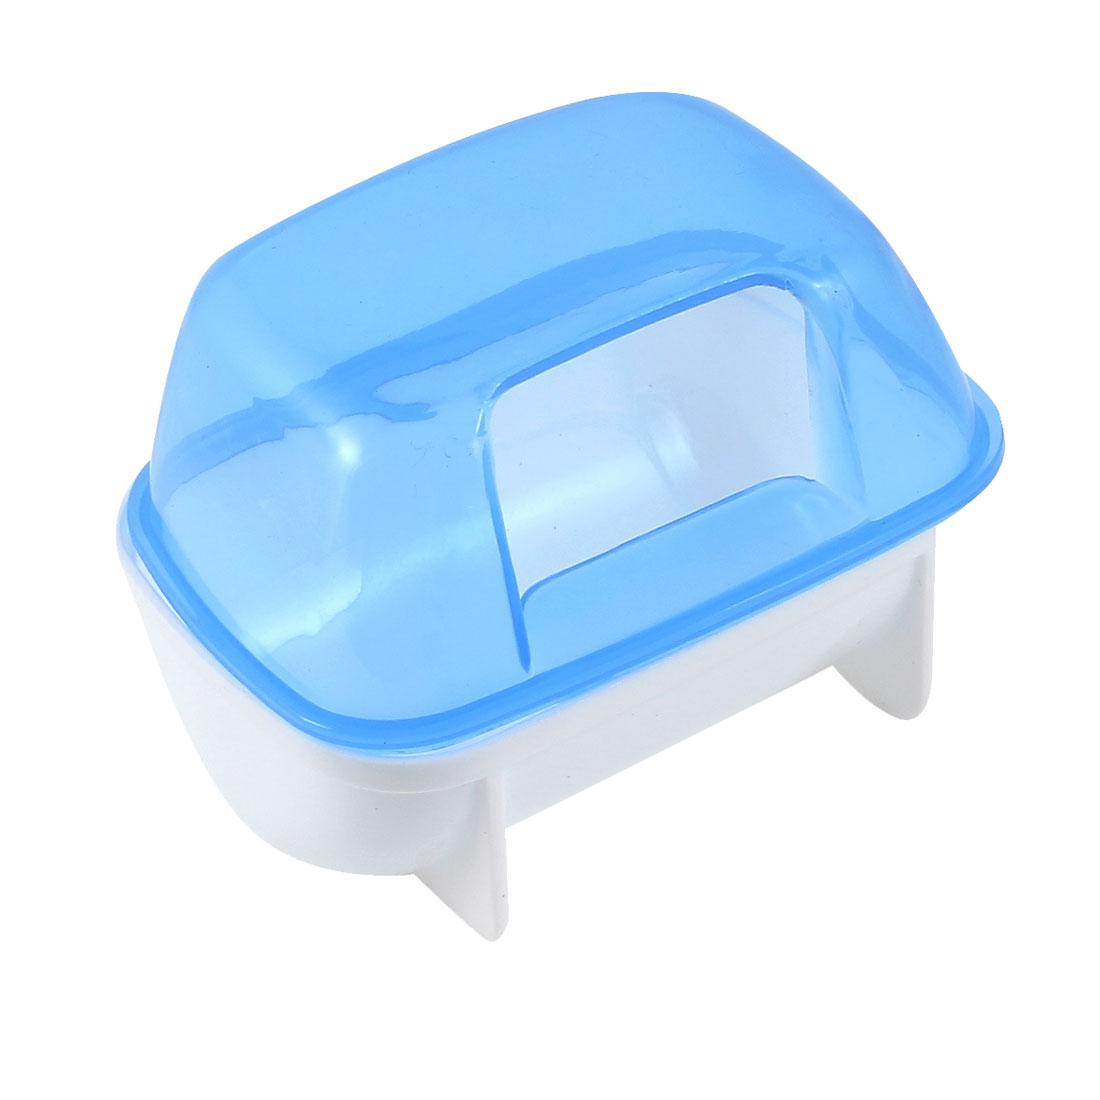 "Pet Hamster Bathroom Bath Sand Room Sauna Toilet Blue White 3.9"" x 2.8"" x 2.8"""